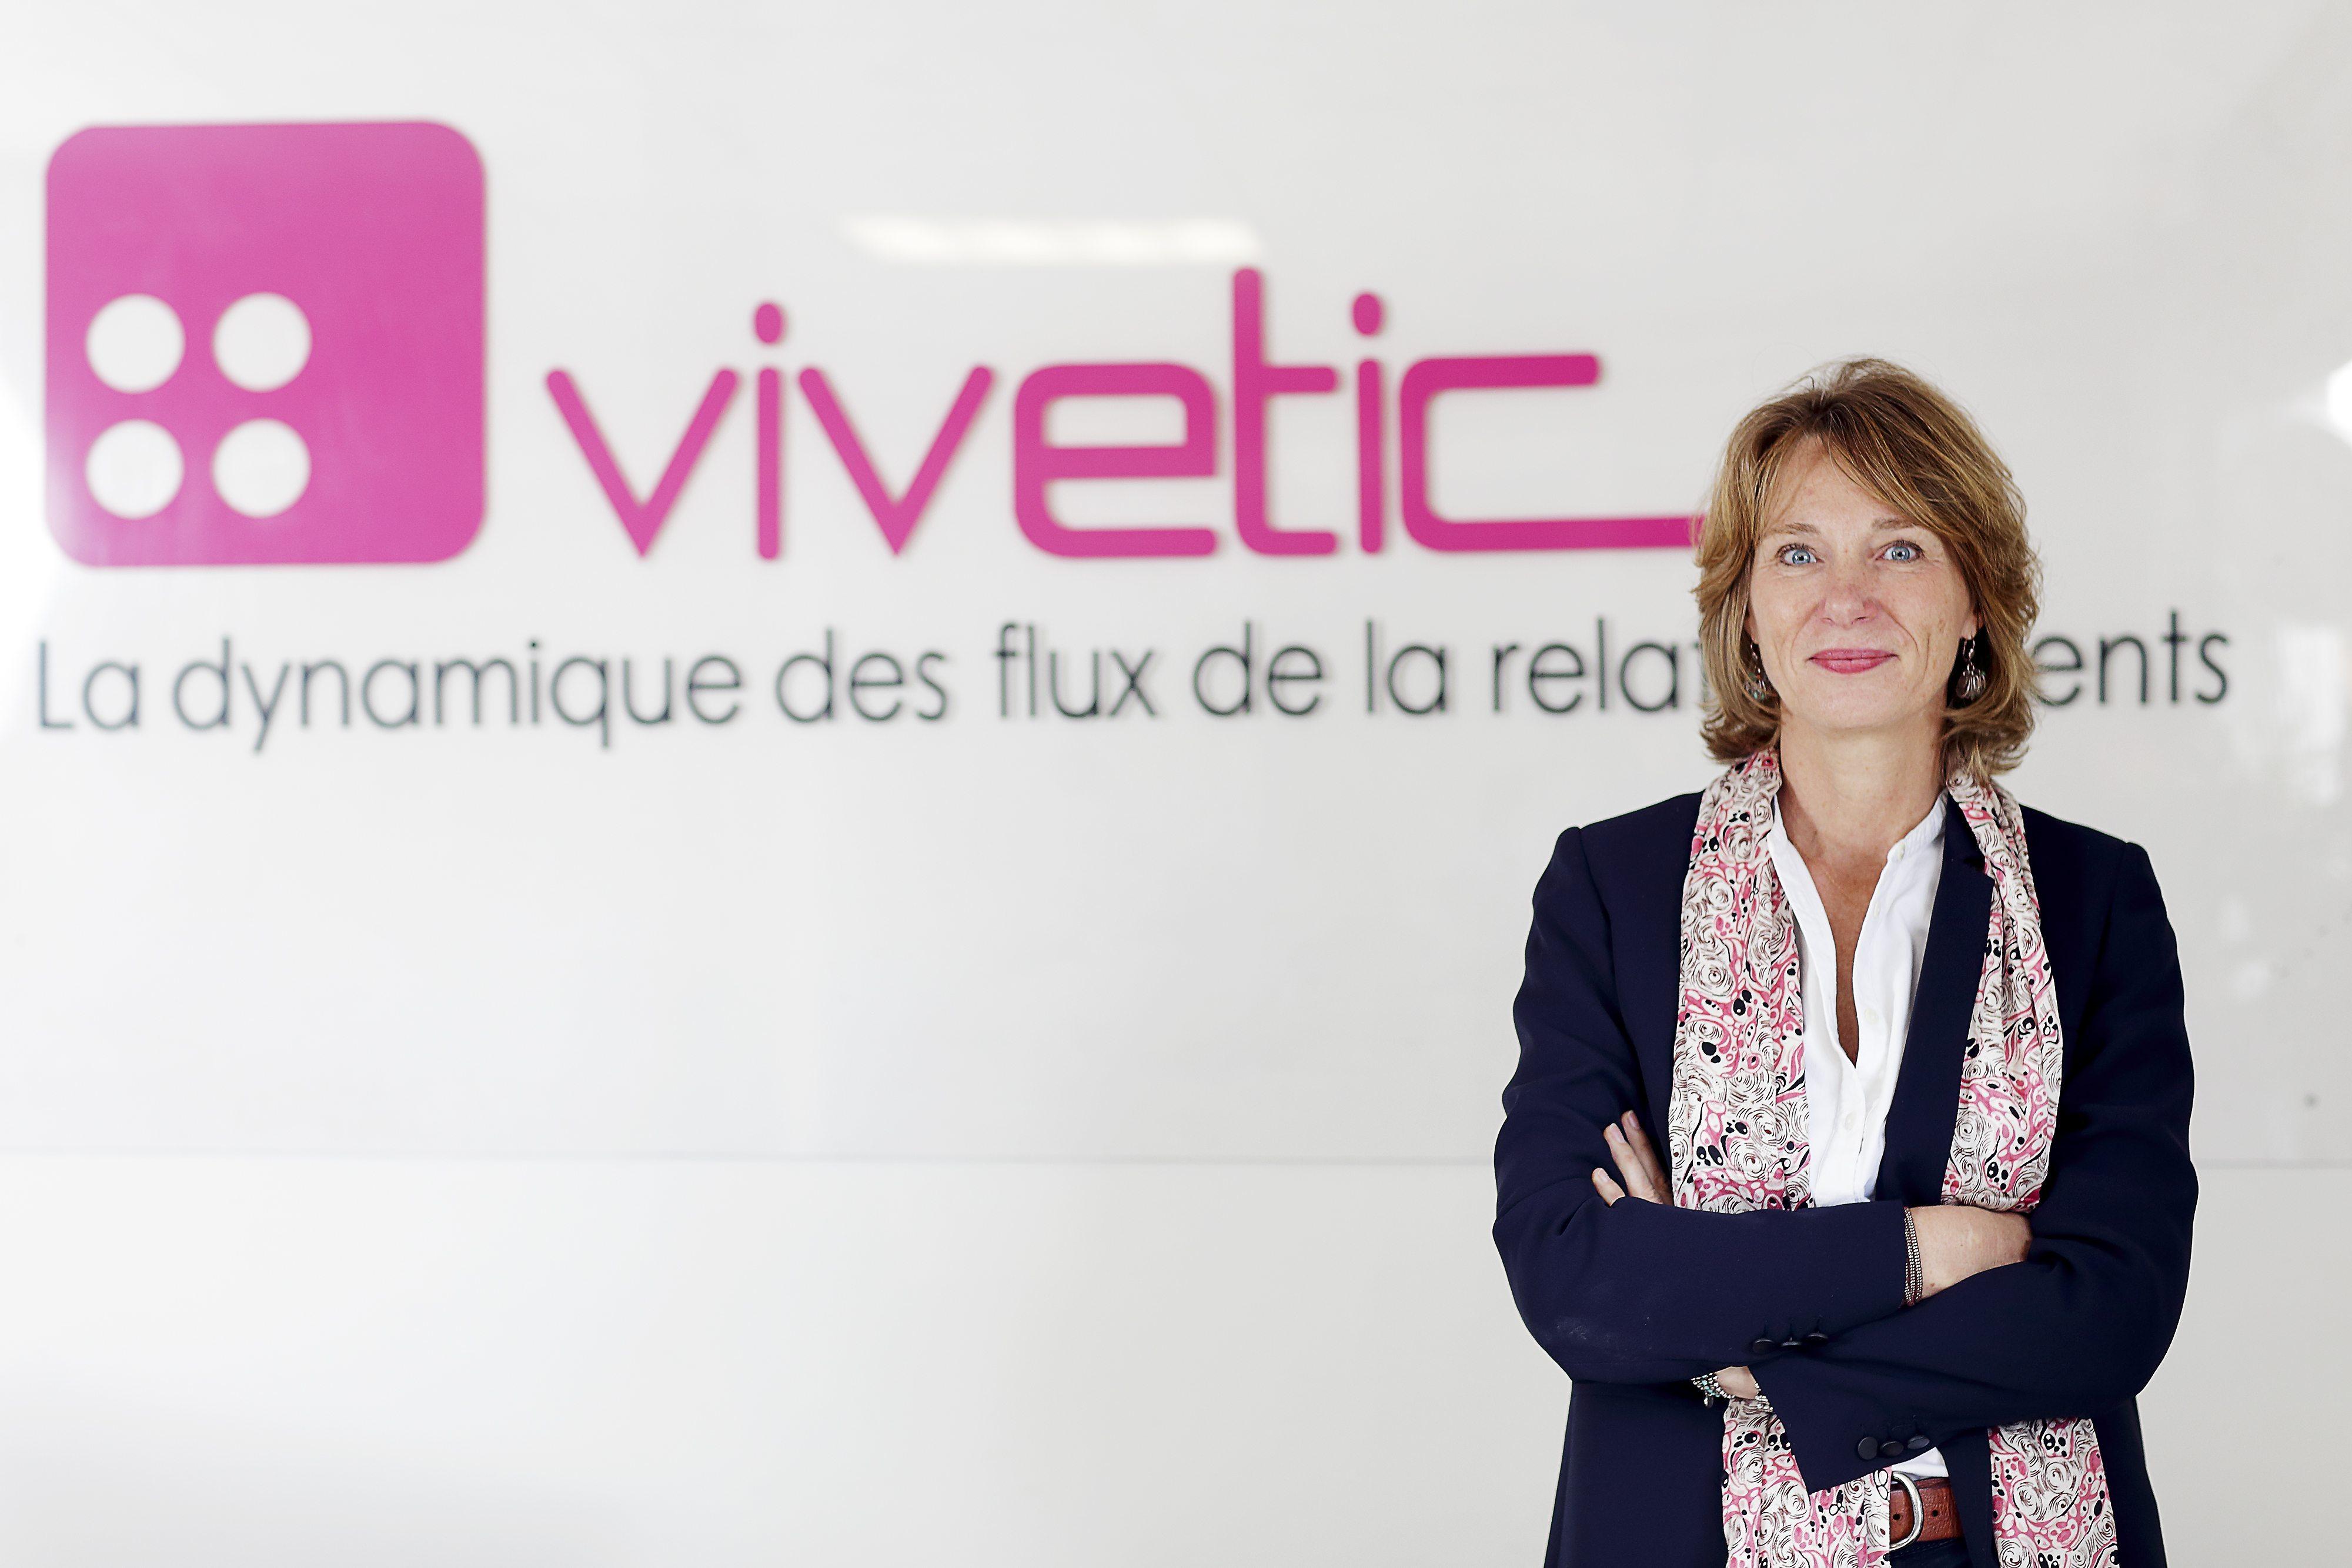 Anne Laratte - DG - Vivetic